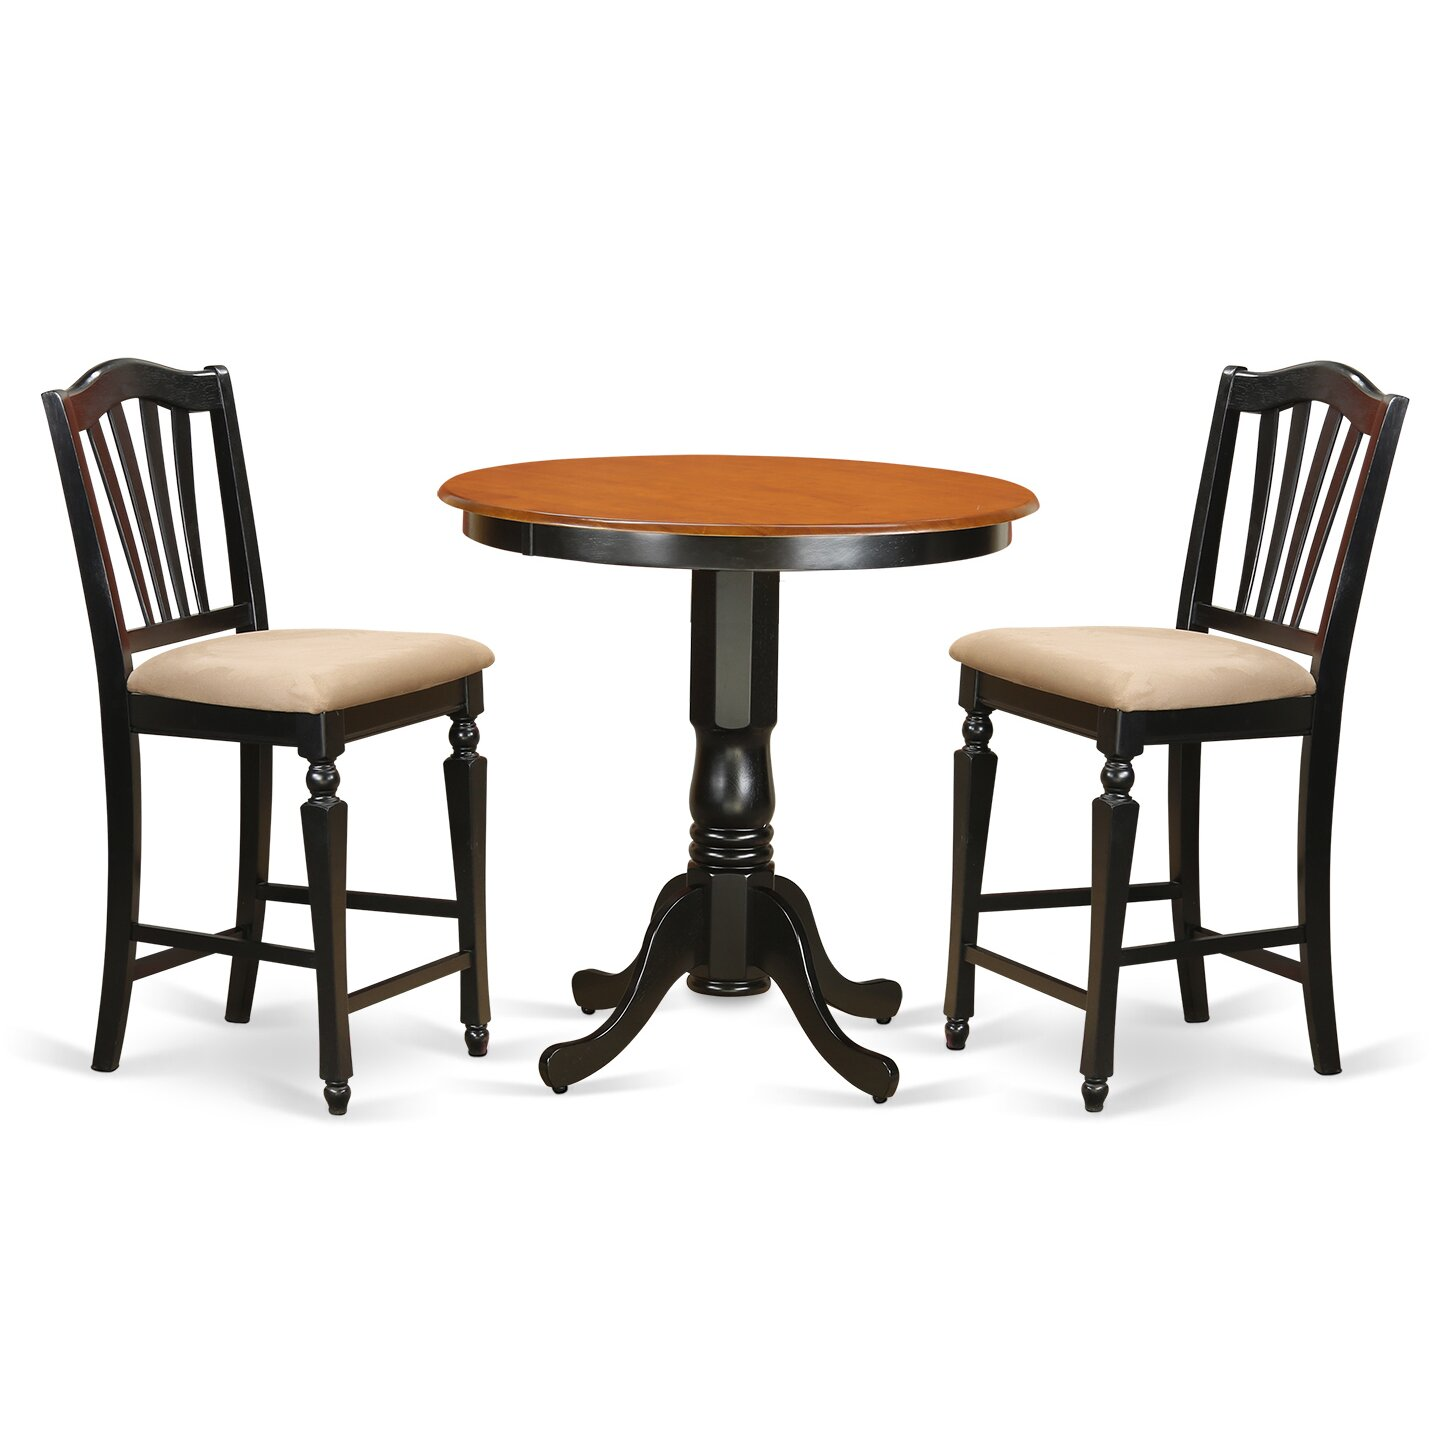 Bar Table Chairs Set Crown Mark Alyssa 3 Piece Bar Table: East West Jackson 3 Piece Counter Height Pub Table Set